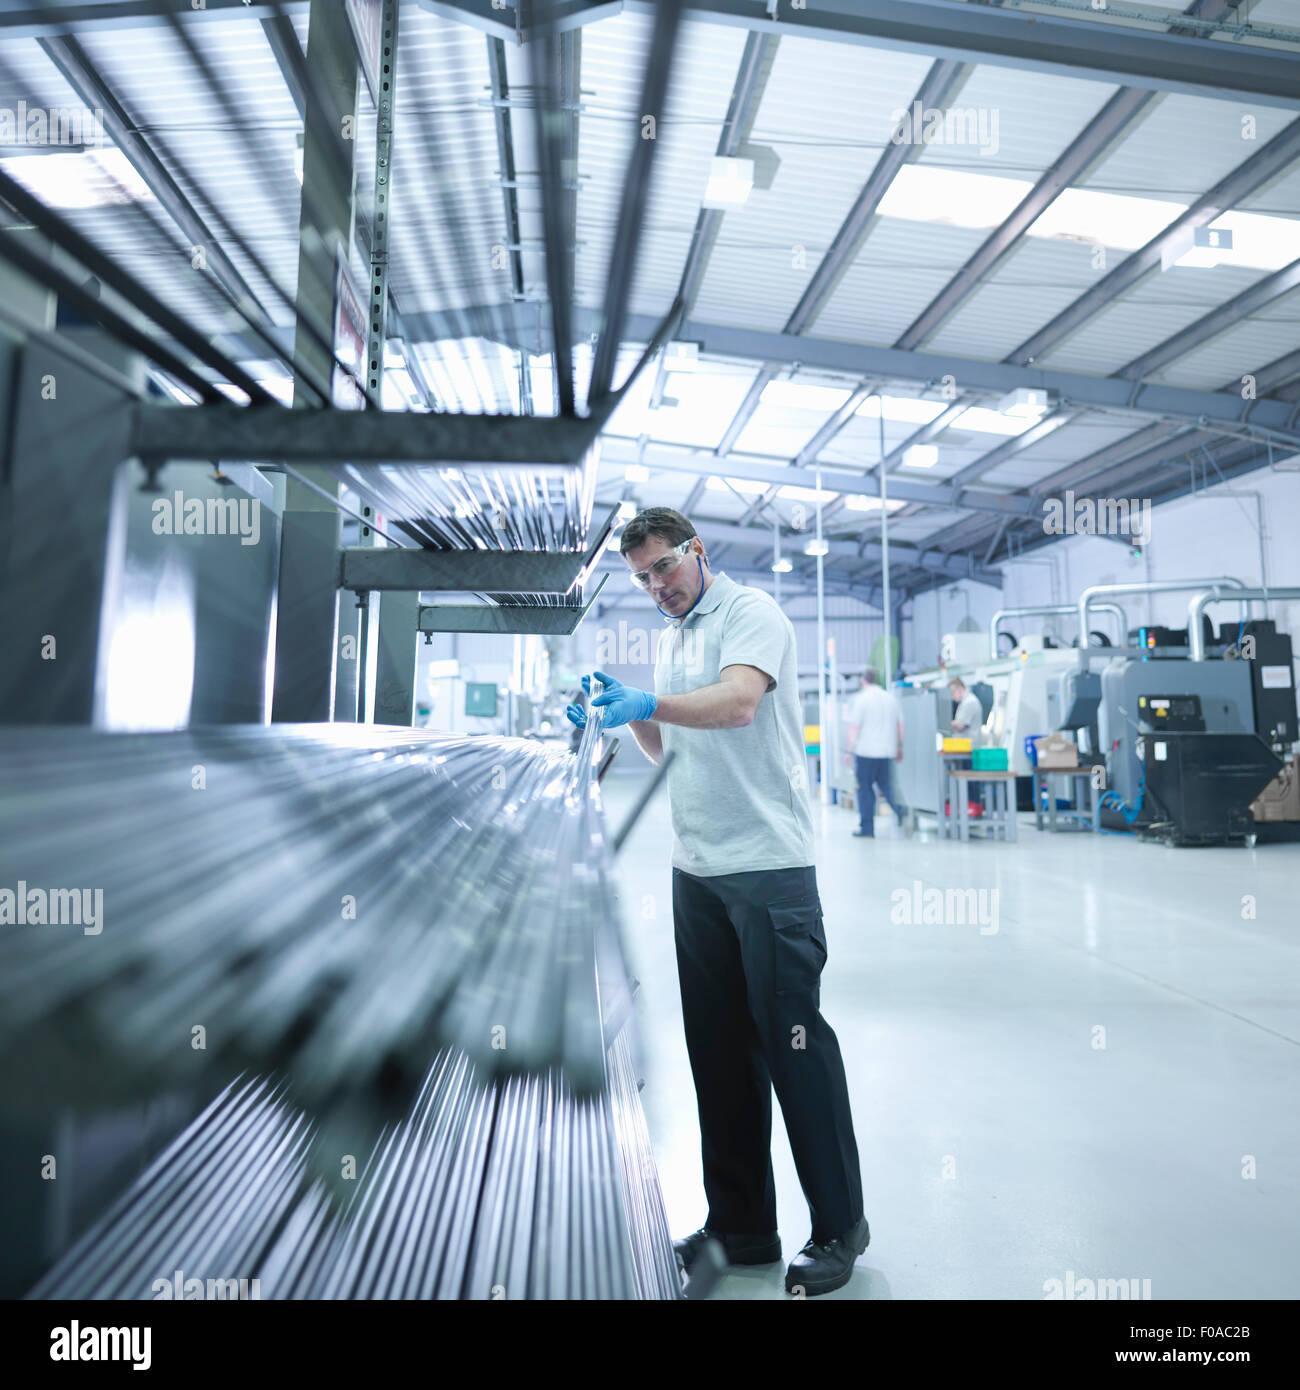 Engineer inspecting steel rods in factory - Stock Image